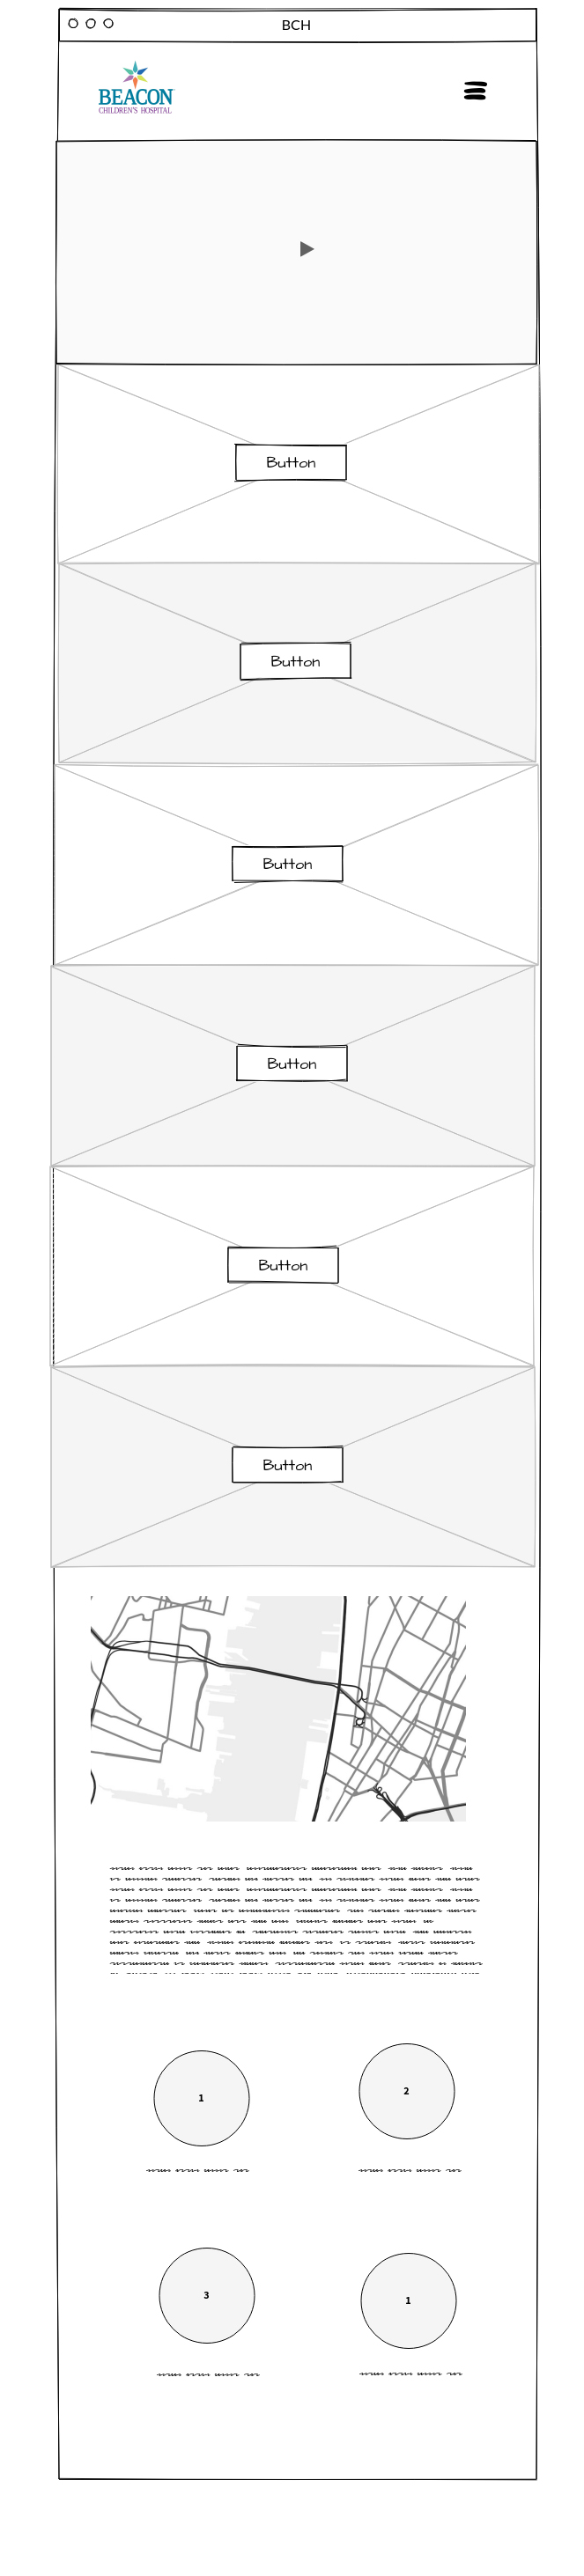 mobile layout.jpg